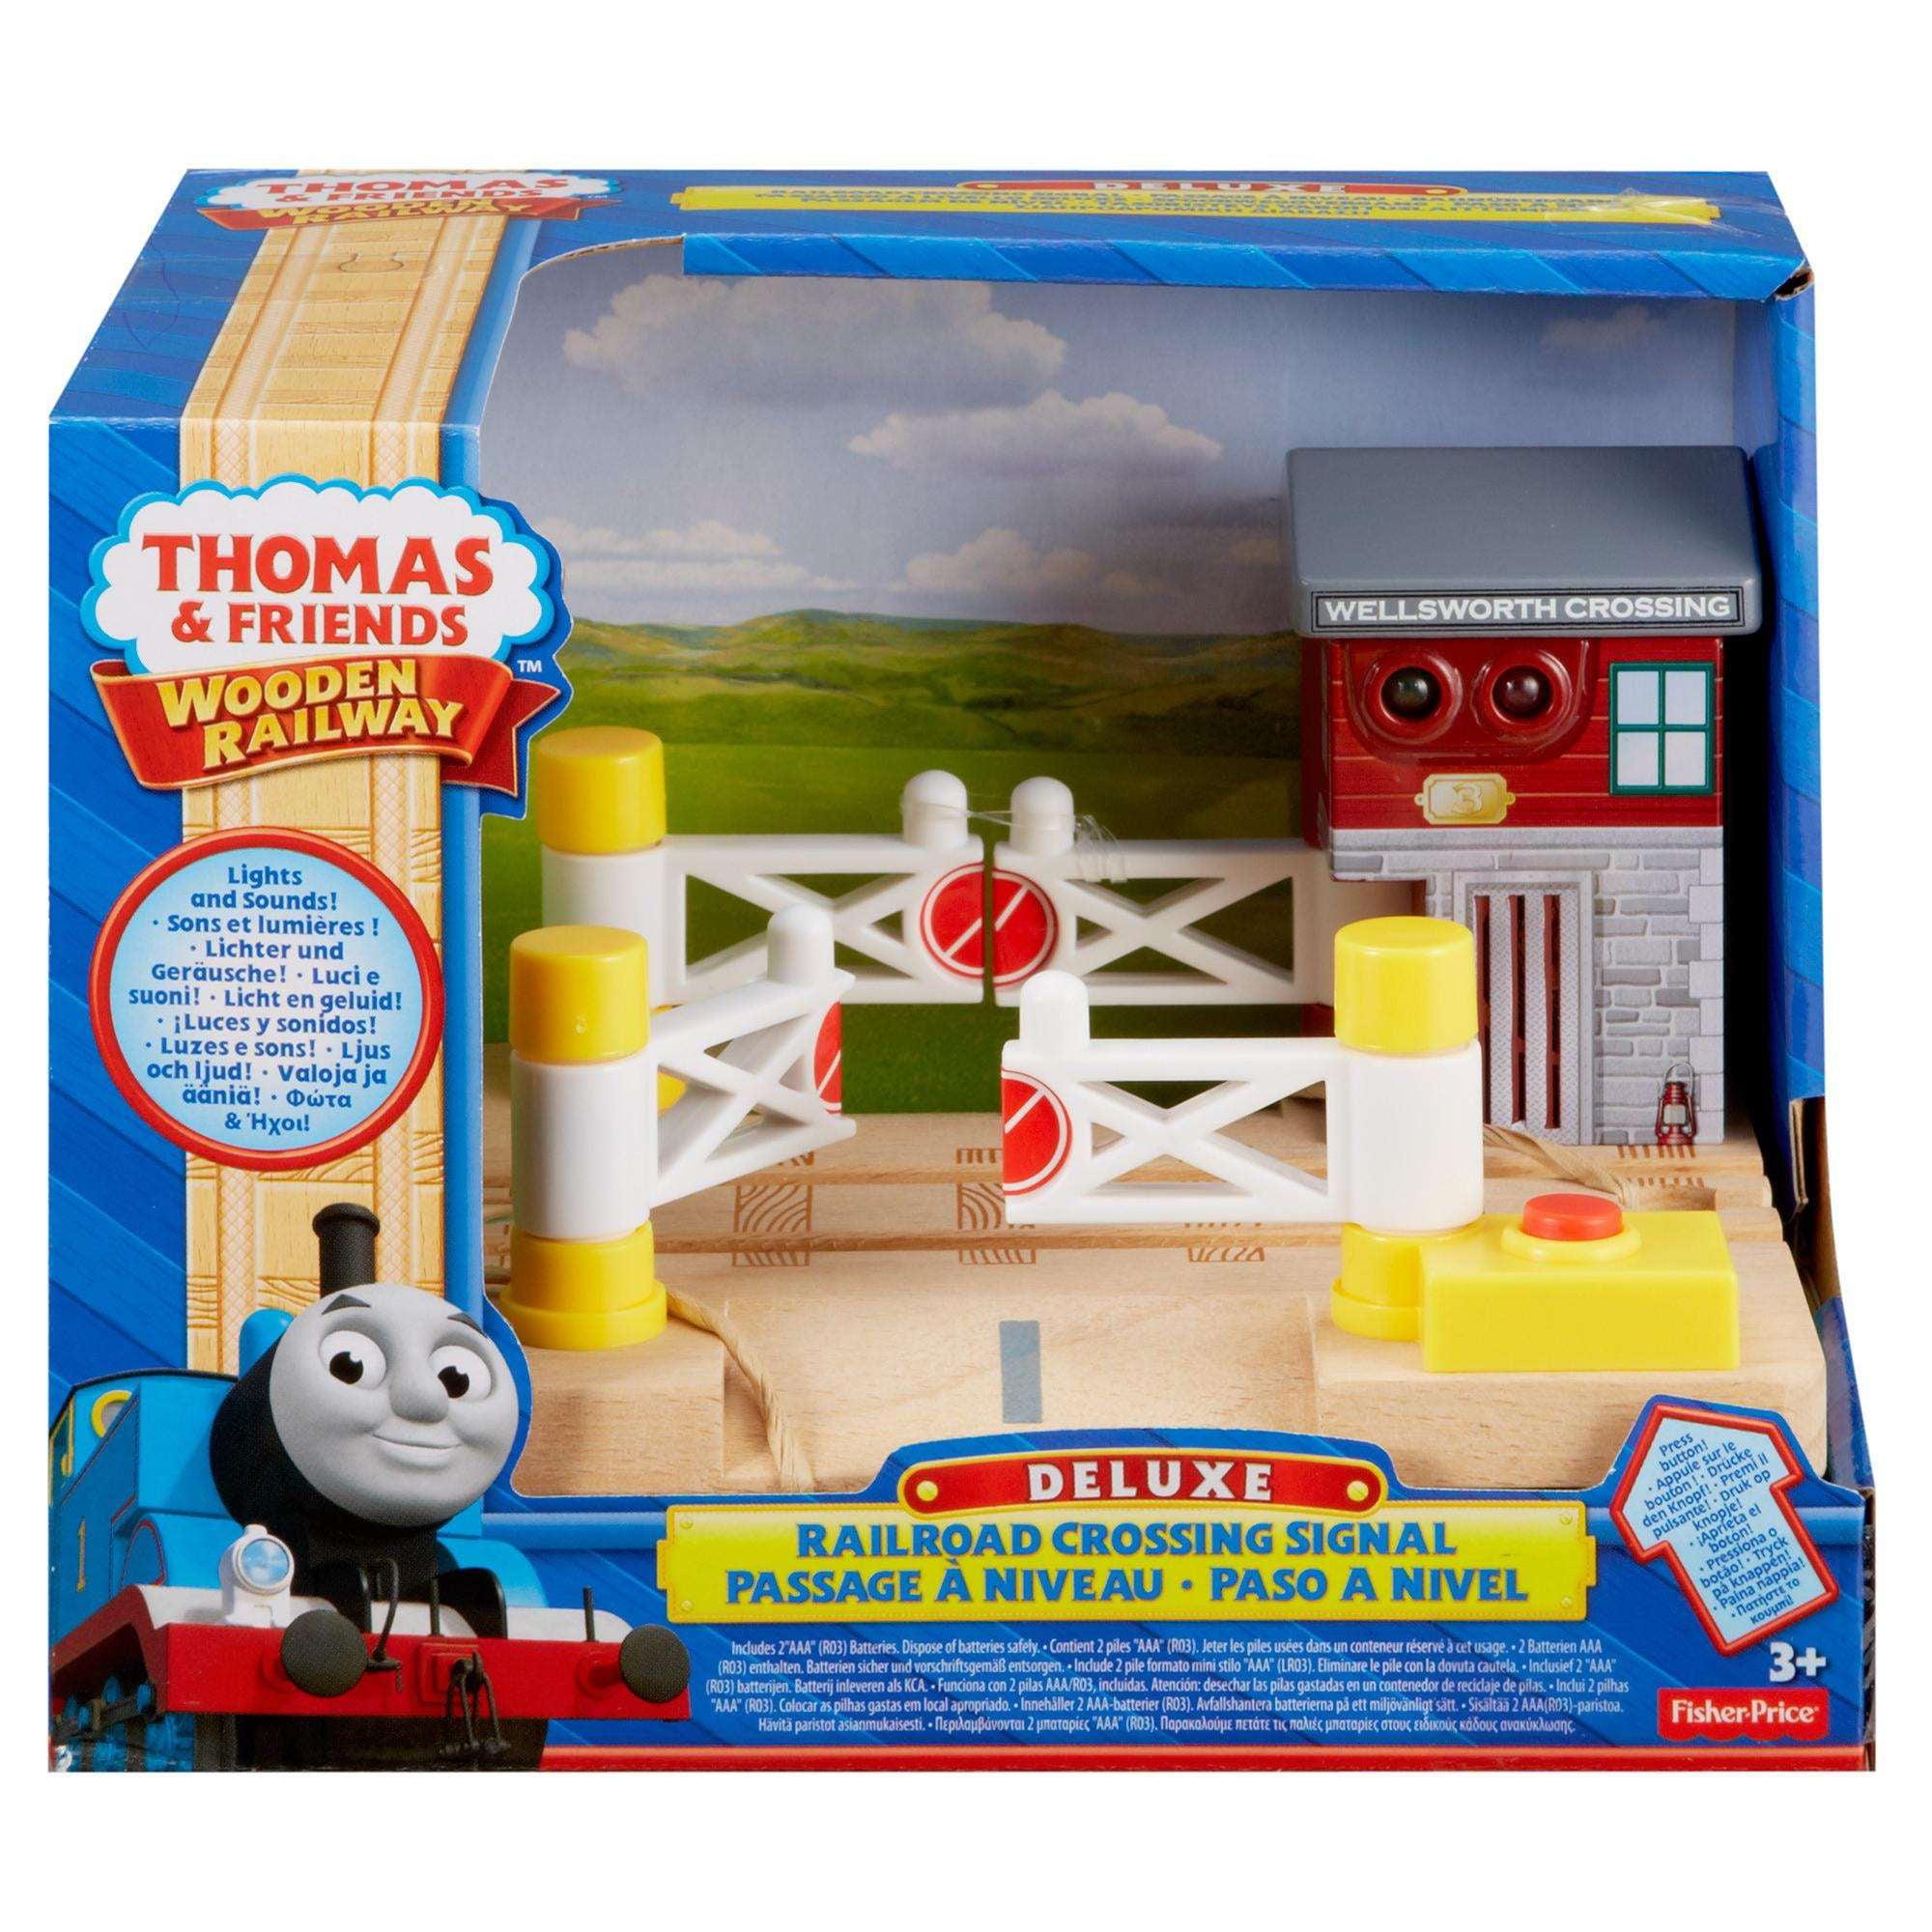 Thomas & Friends Wooden Railway Deluxe Railroad Crossing